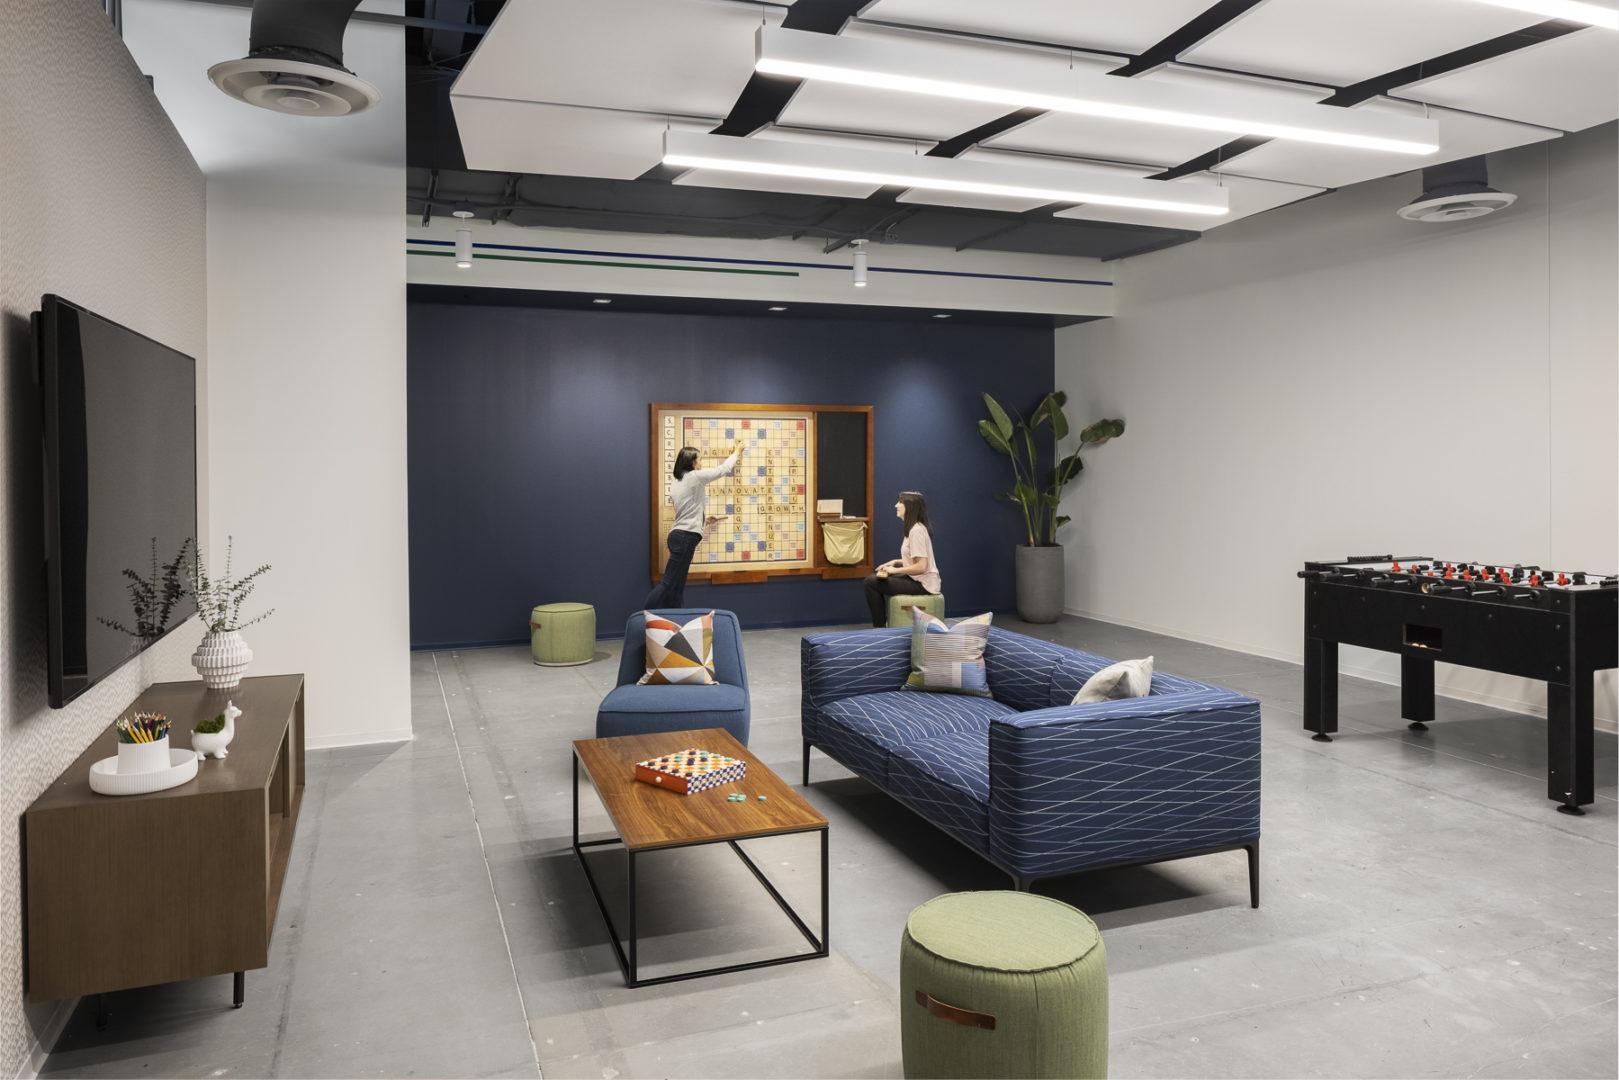 Cognizant game room